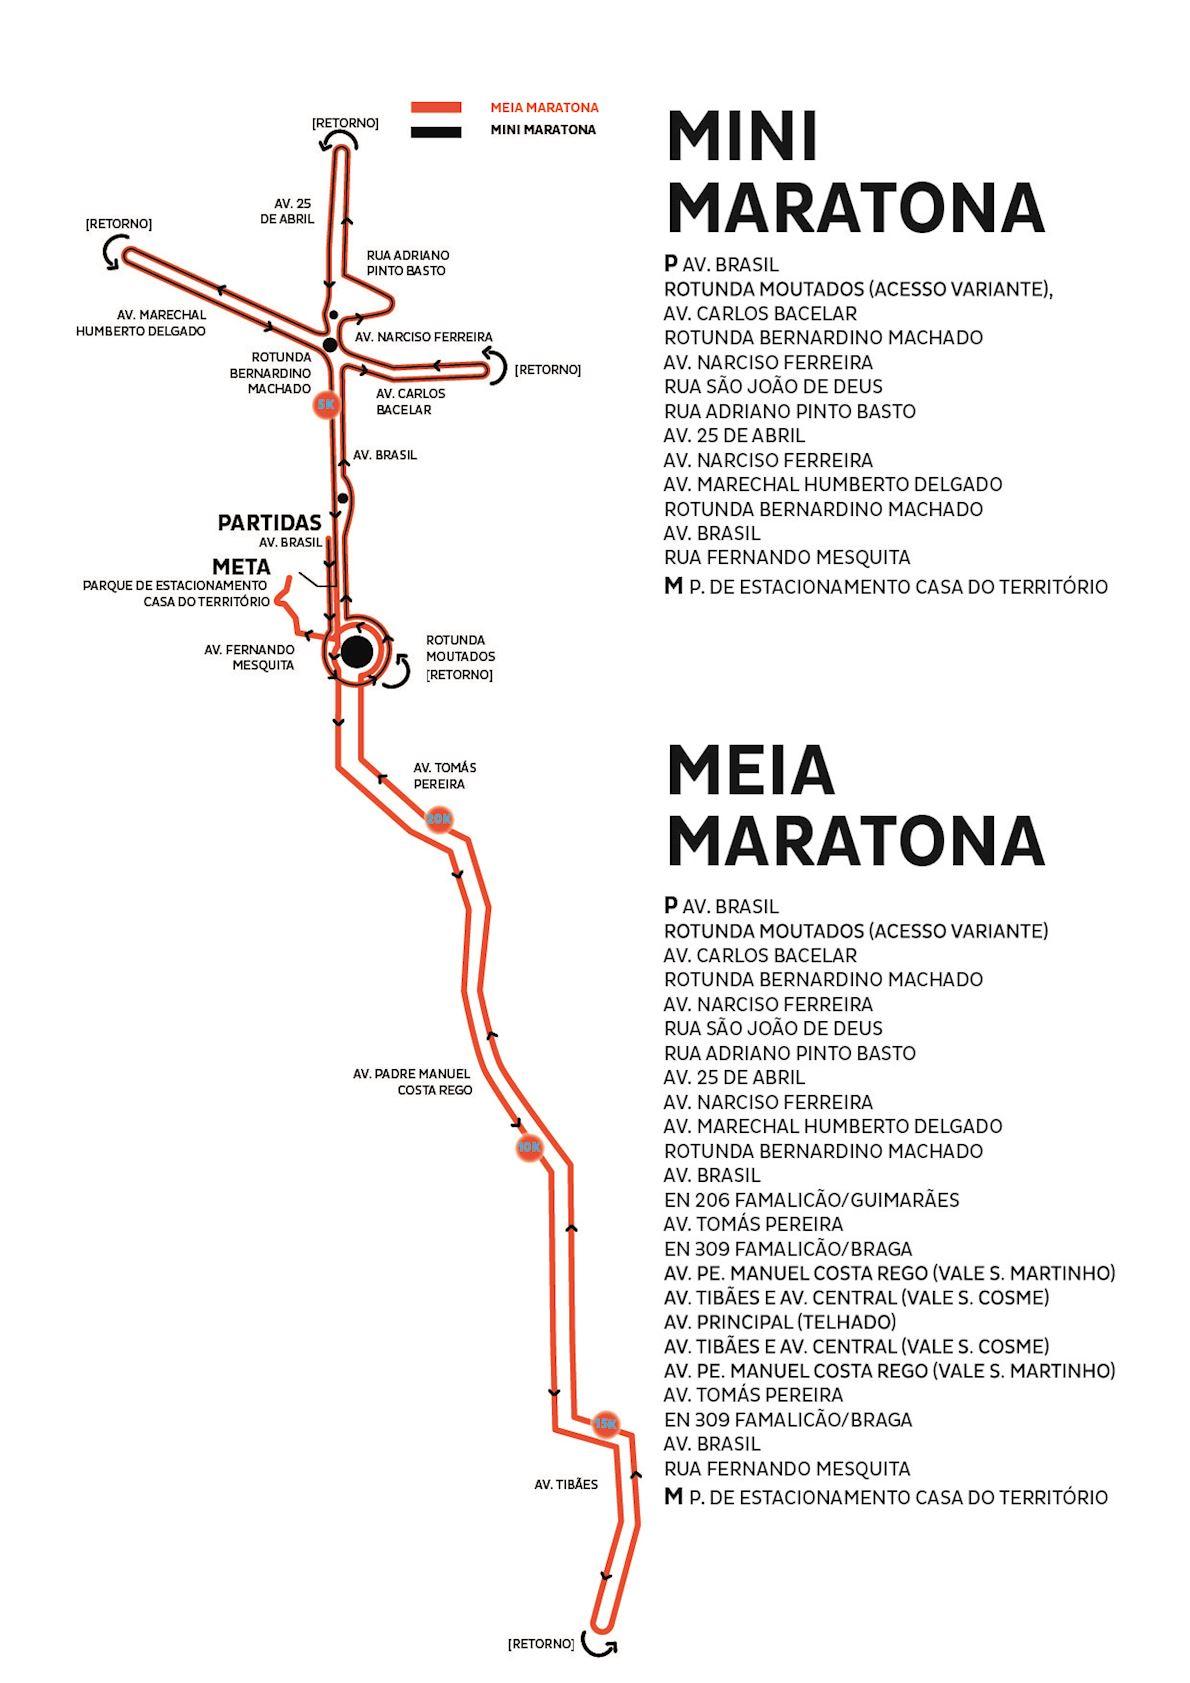 Meia Maratona de Famalicão 路线图